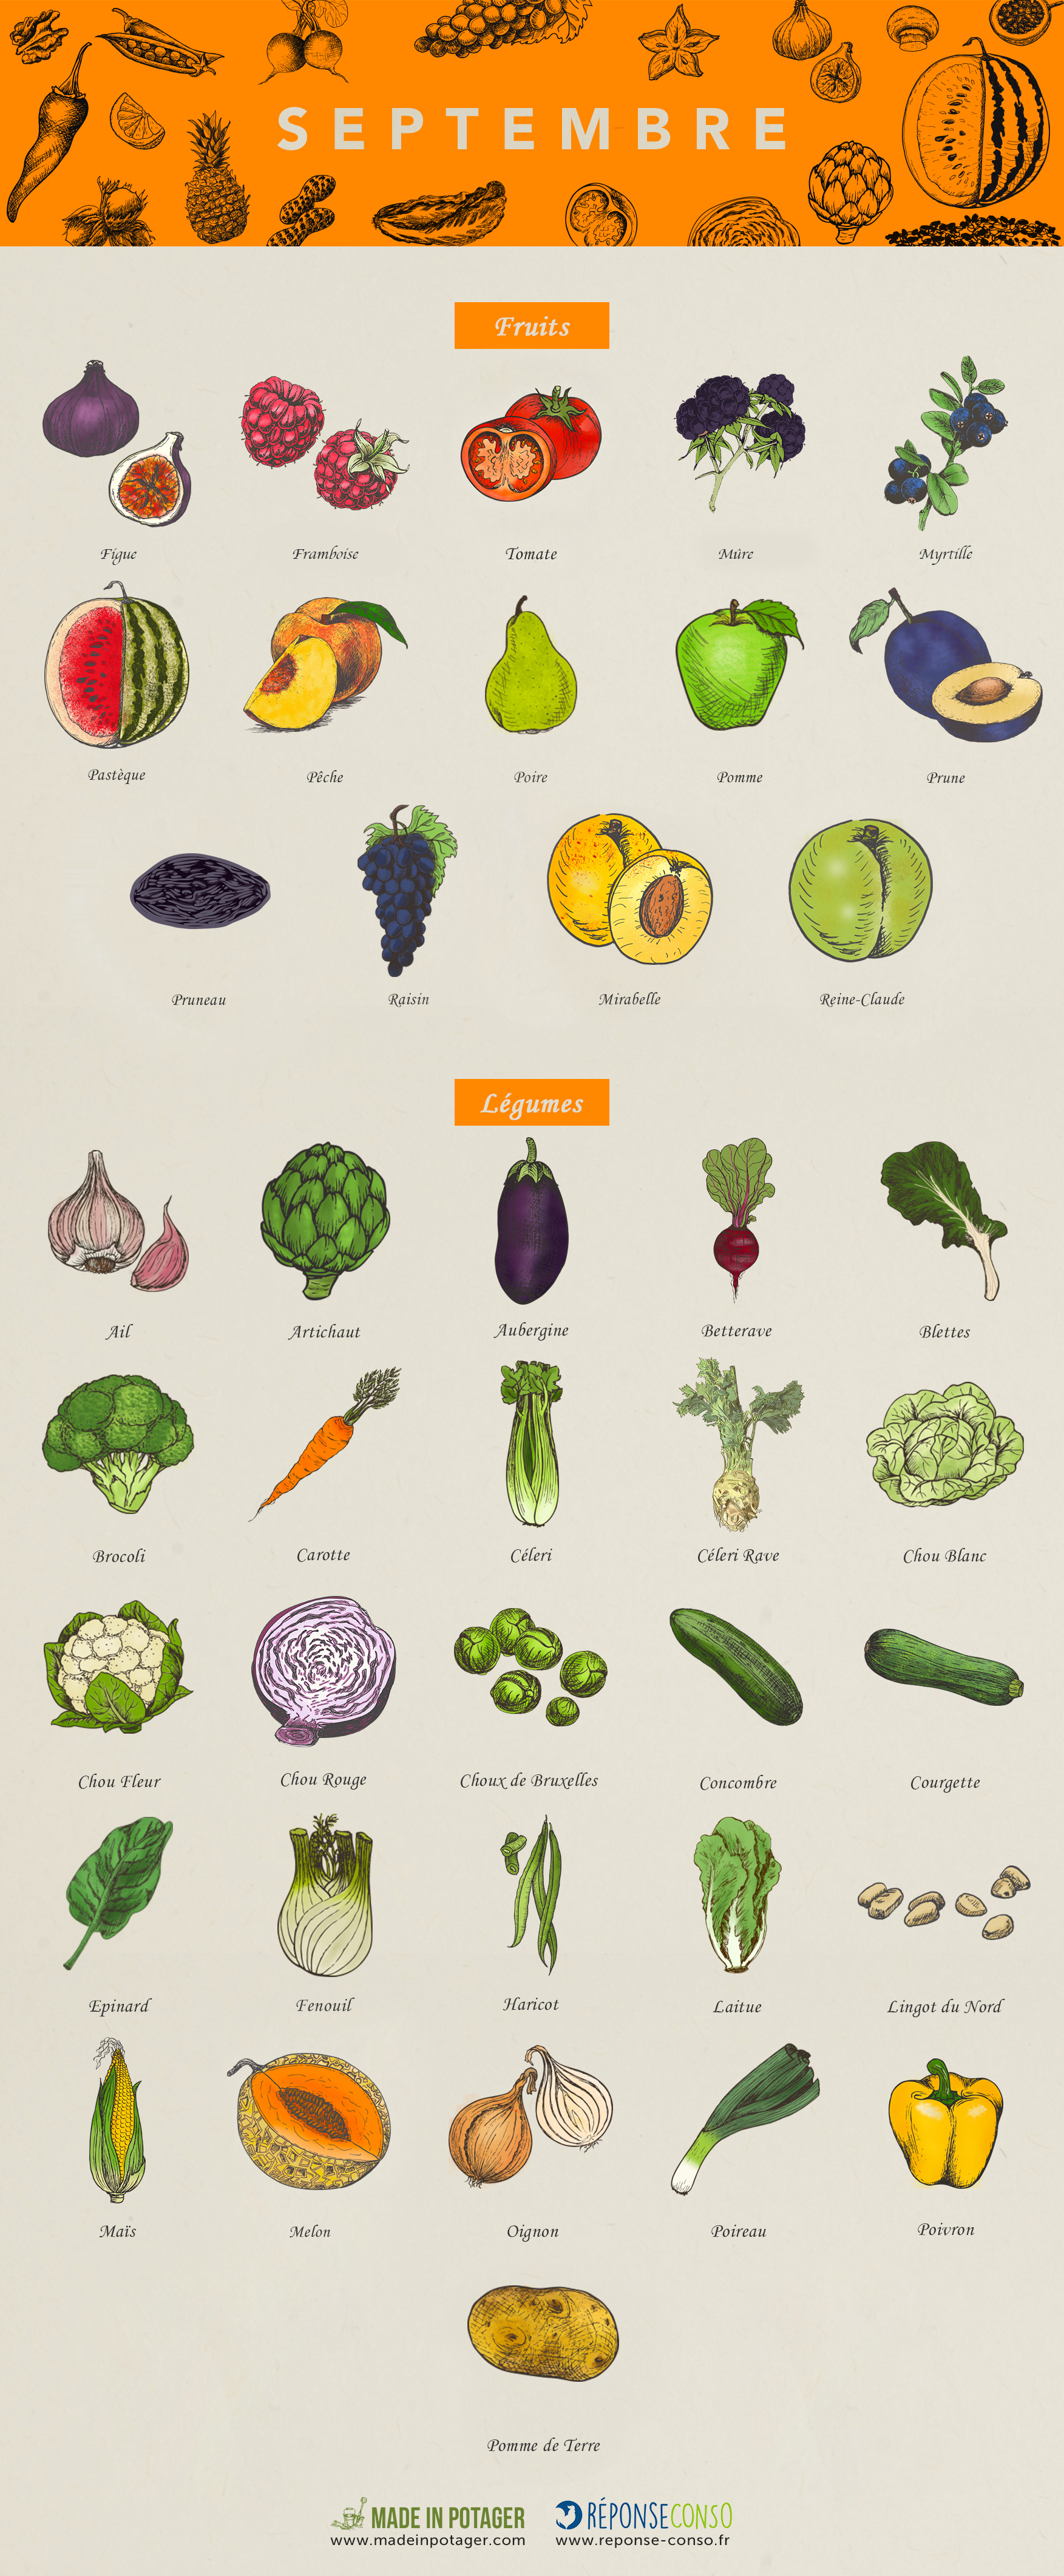 Calendrier Fruits Legumes.Calendrier Fruits Legumes Septembre Modifok Reponse Conso